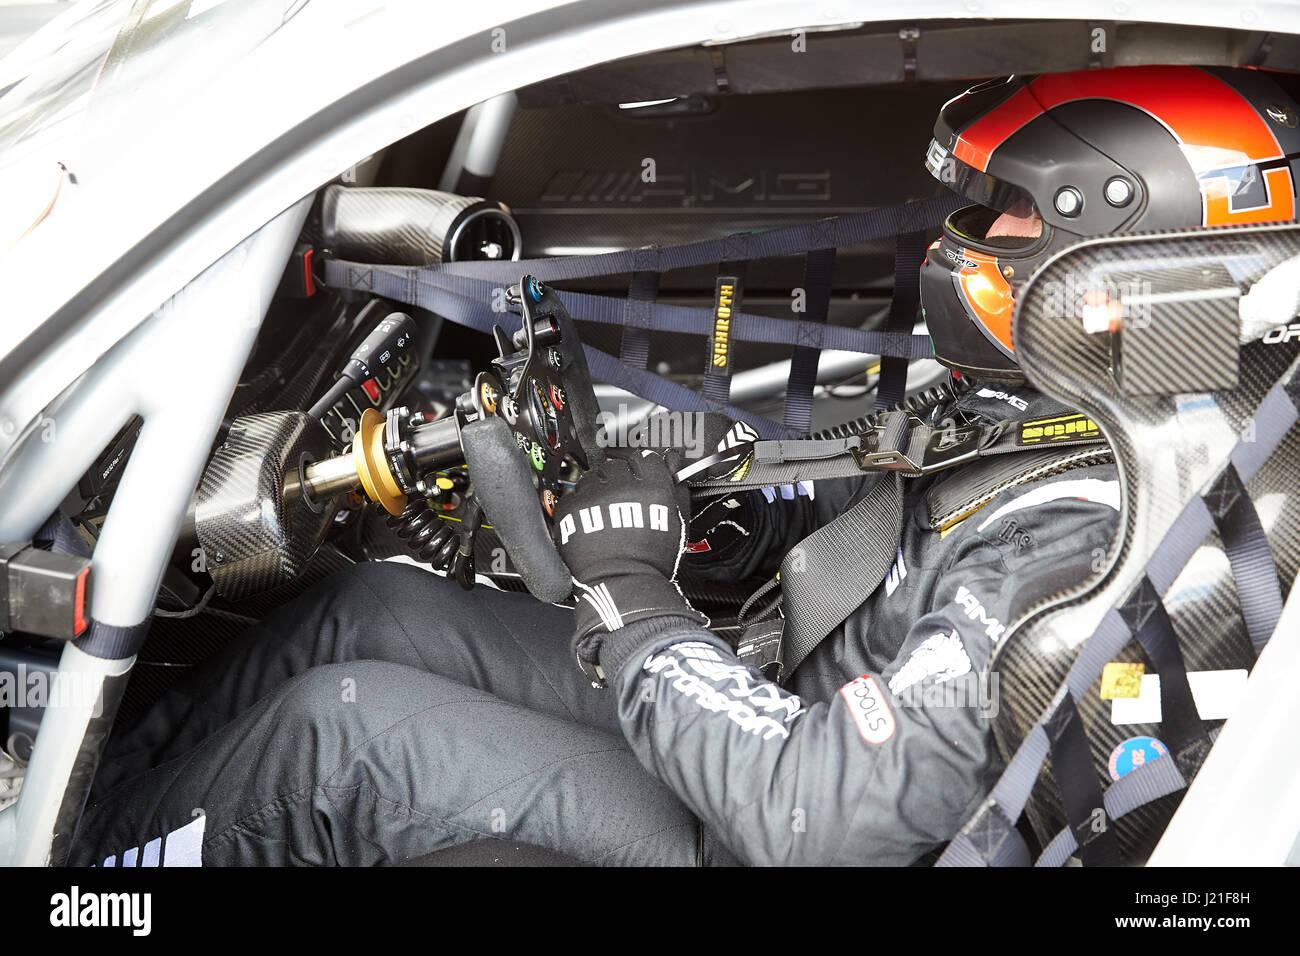 Cockpit Mercedes Amg Gt3 Stock Photos & Cockpit Mercedes Amg Gt3 ... | {Auto cockpit mercedes 97}